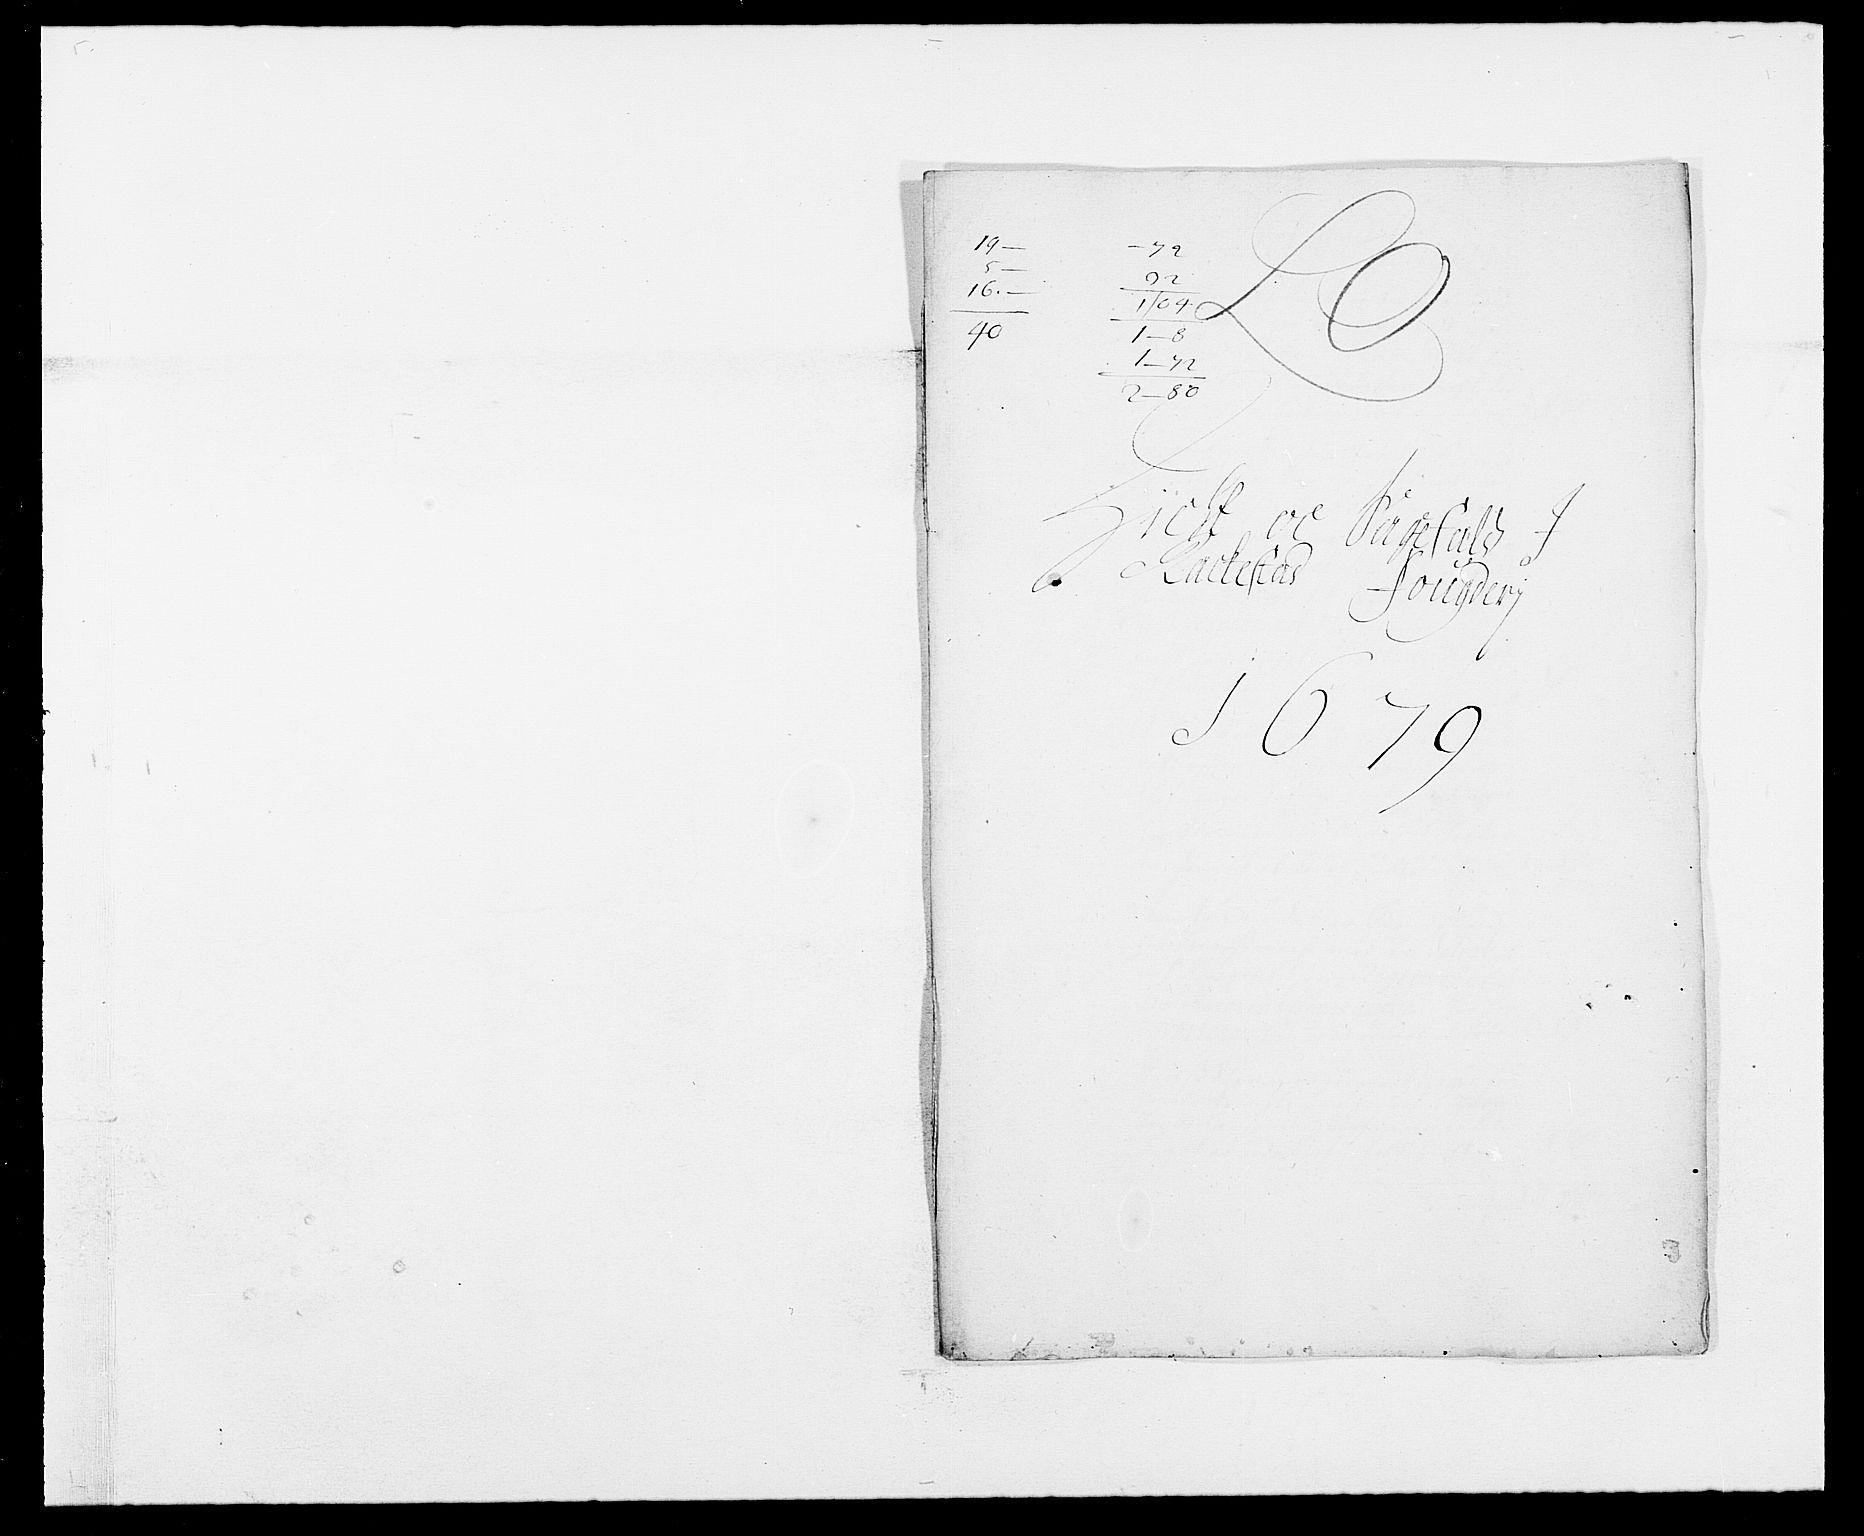 RA, Rentekammeret inntil 1814, Reviderte regnskaper, Fogderegnskap, R05/L0271: Fogderegnskap Rakkestad, 1678-1679, s. 300